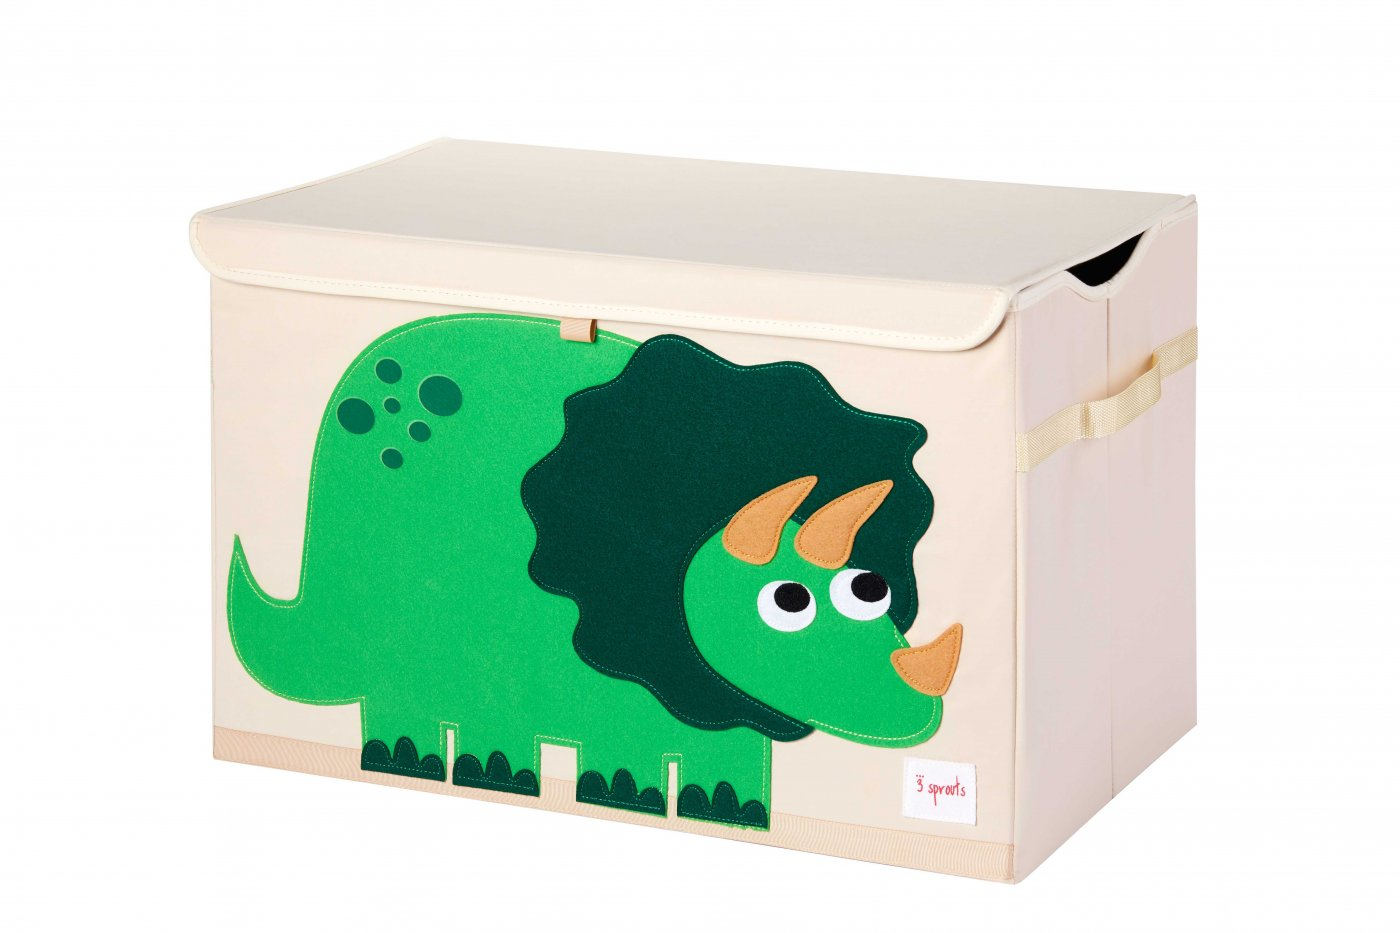 Picture of: 3 Sprouts Opbevaringskasse Med Lag Dinosaur 3 Sprouts Onlinekids Dk